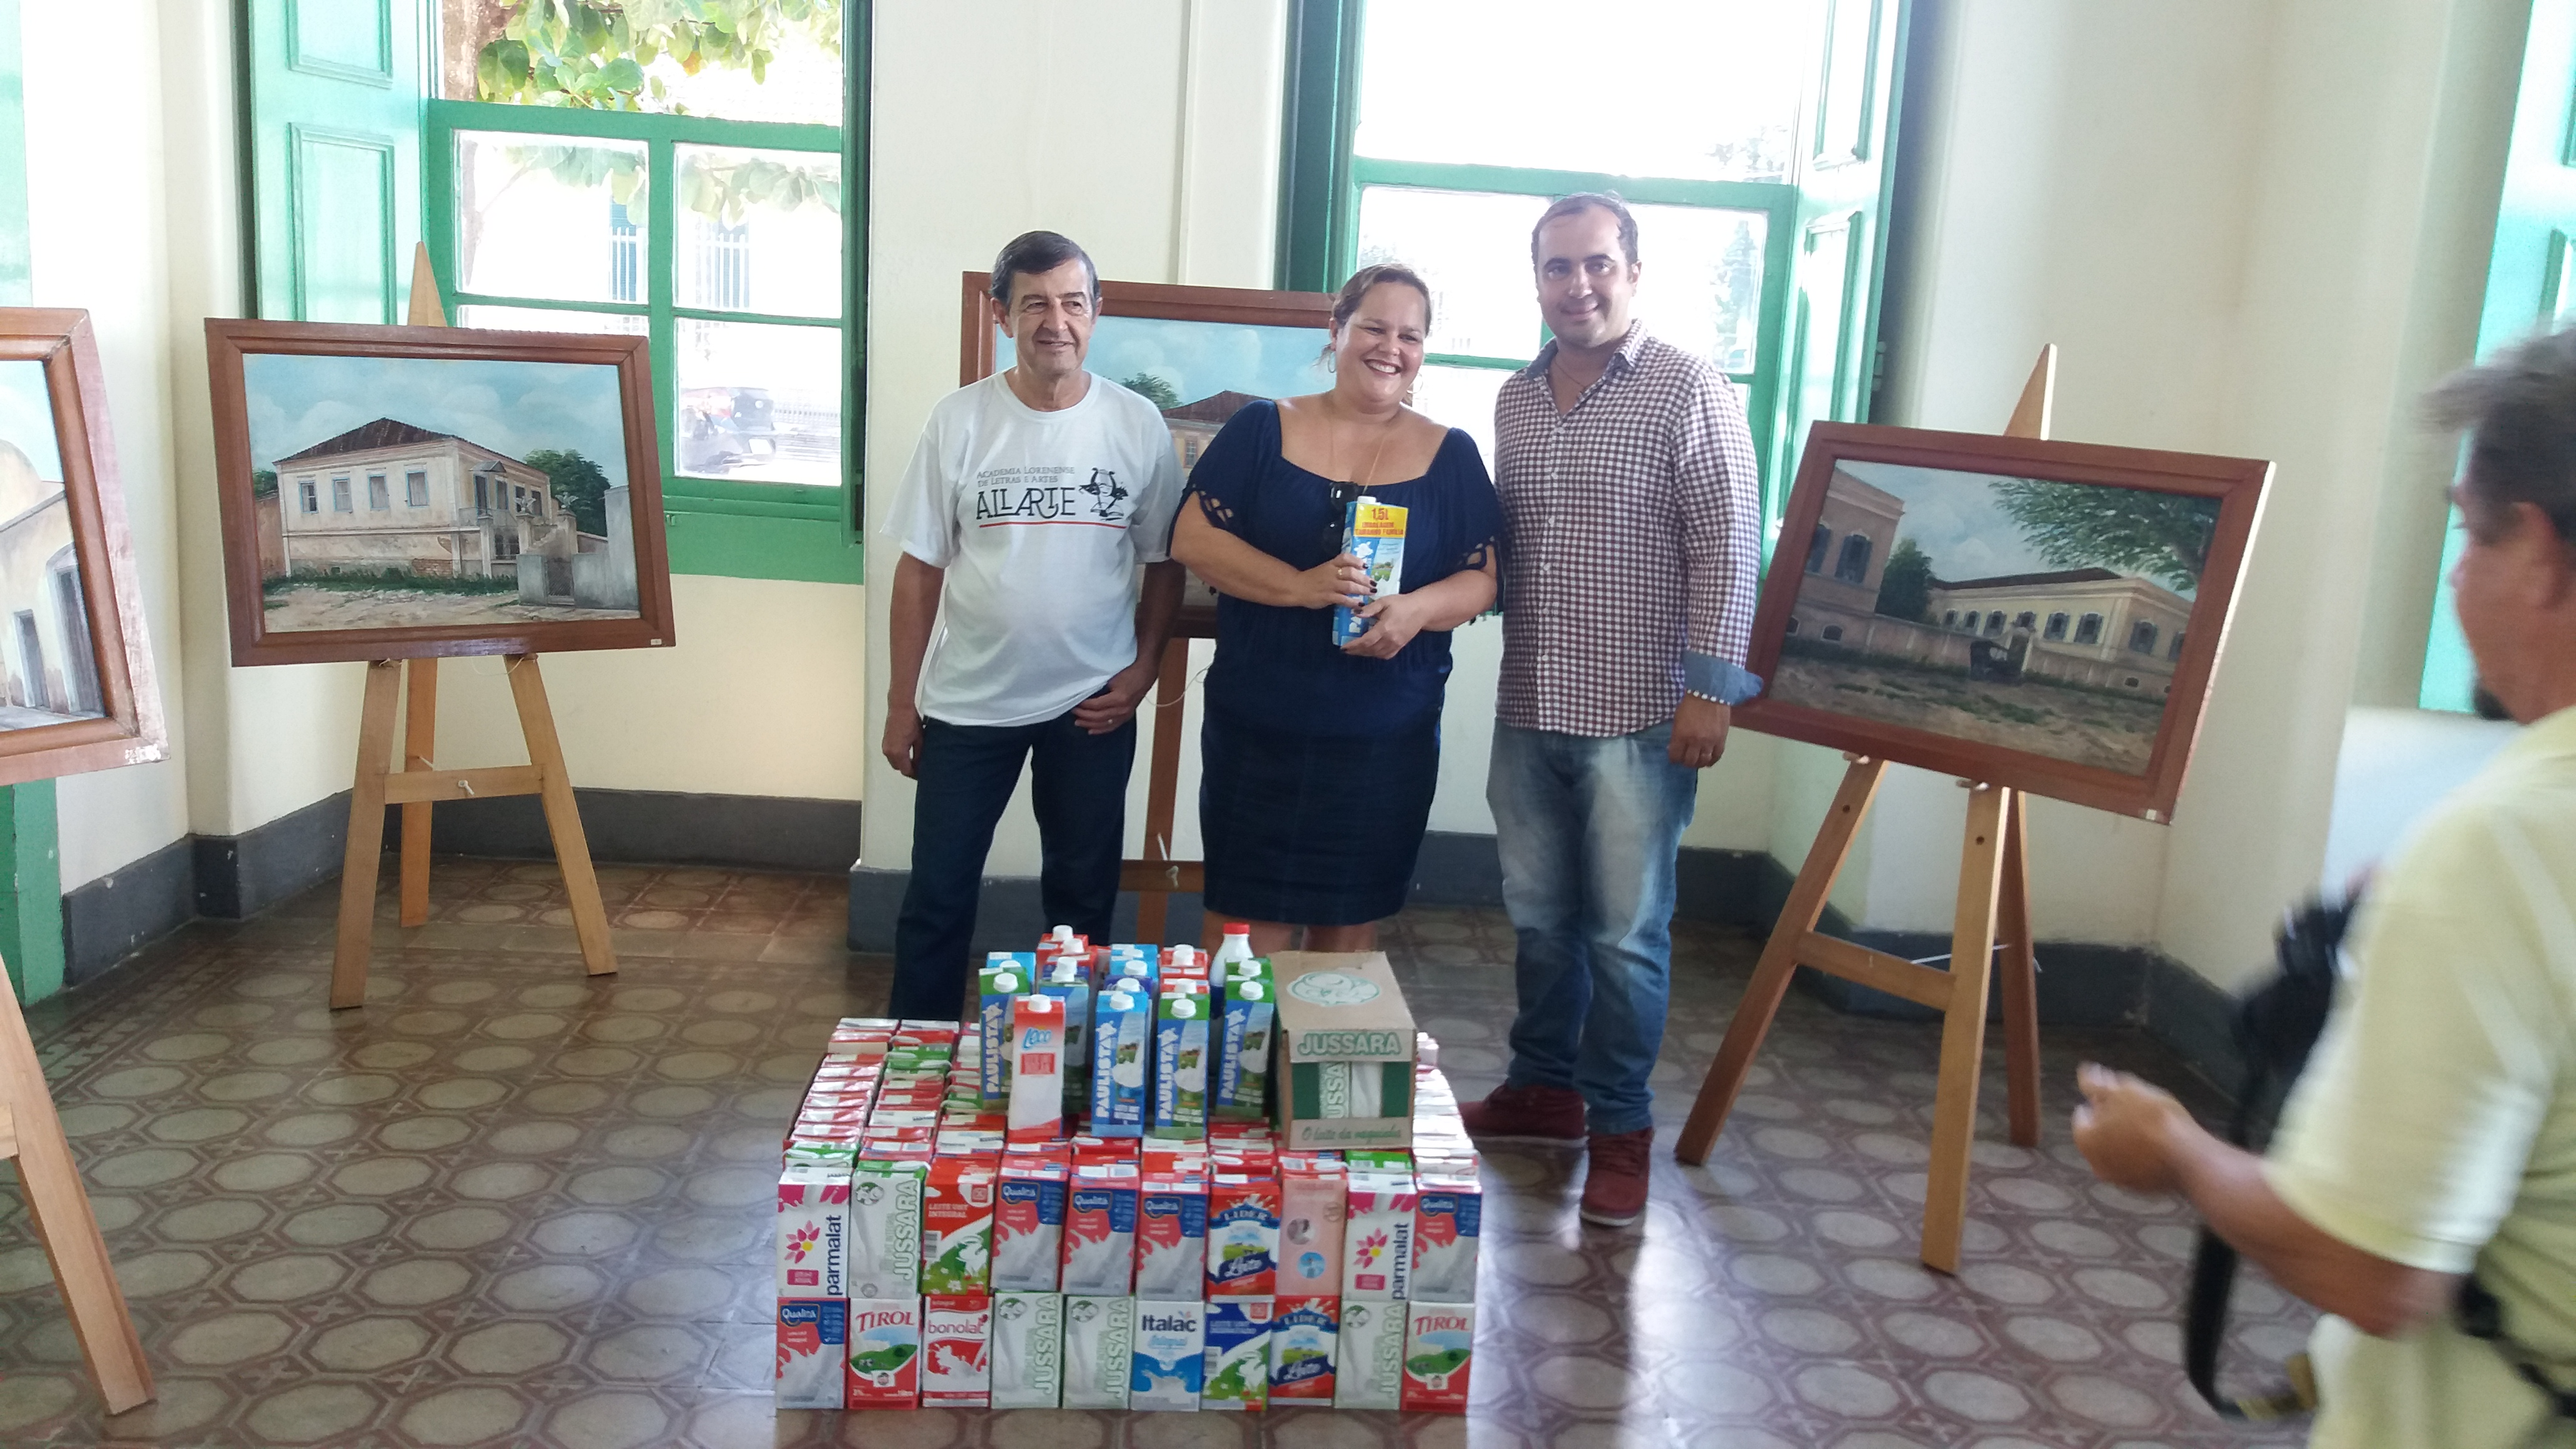 20170410_allarte leite (58)